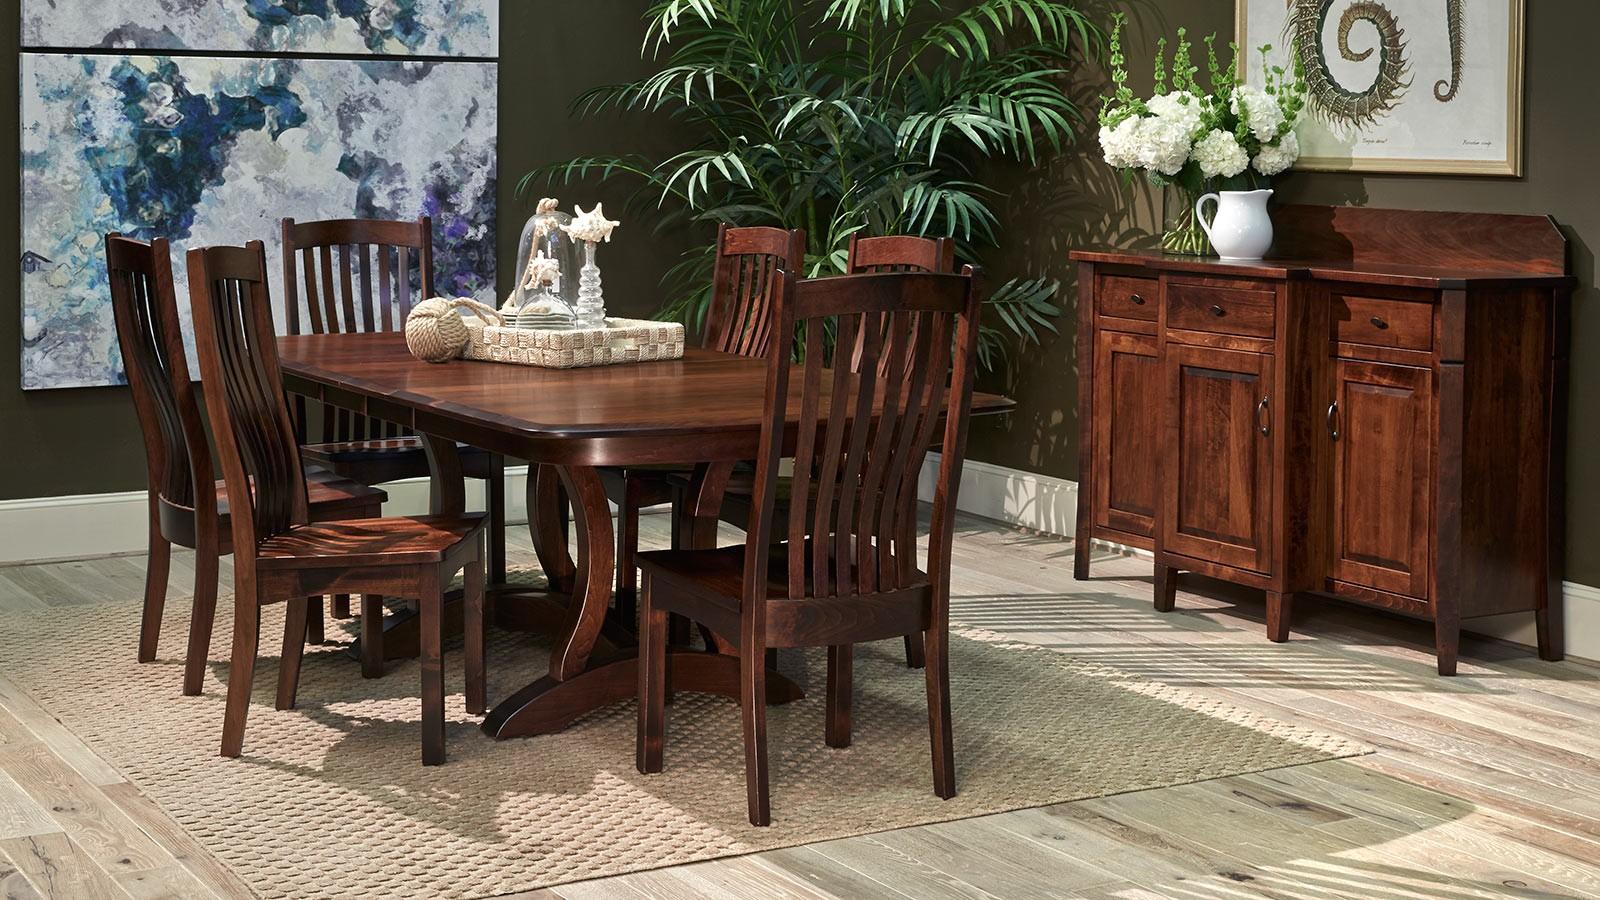 gusa-richfield-brown-maple-table